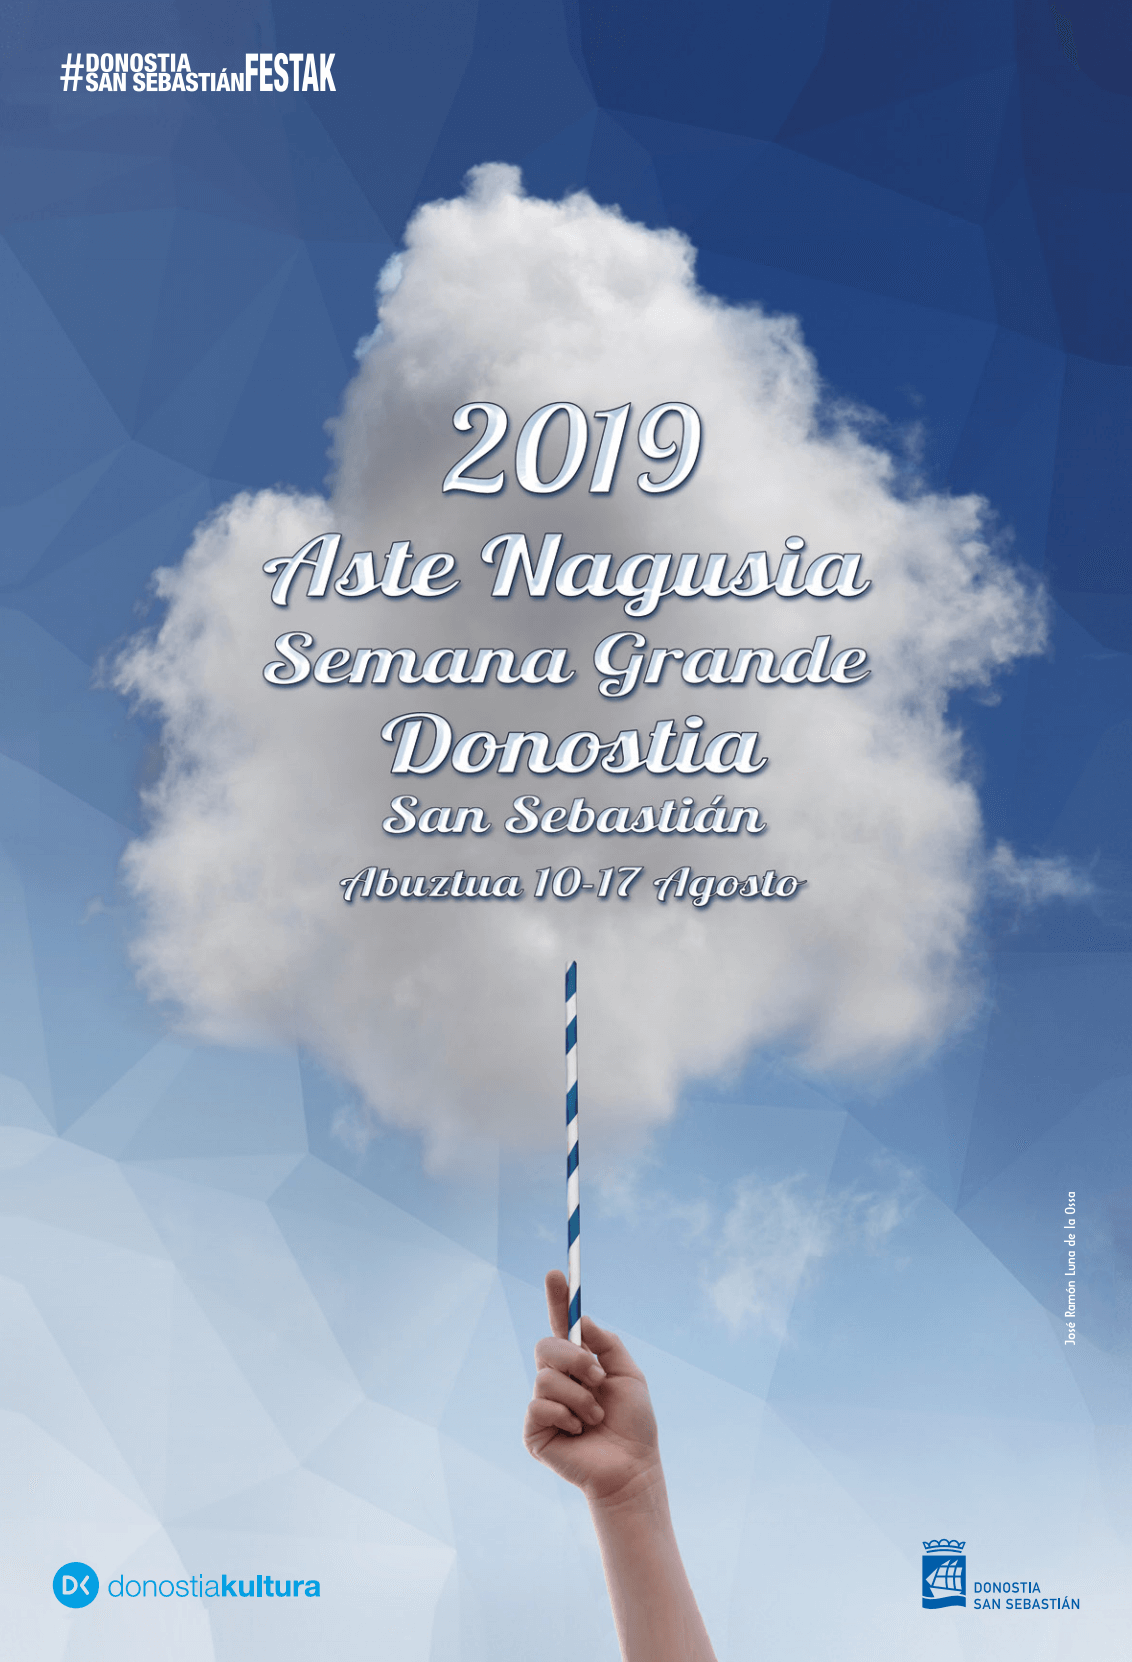 Cartel Aste Nagusia 2019 Donostia